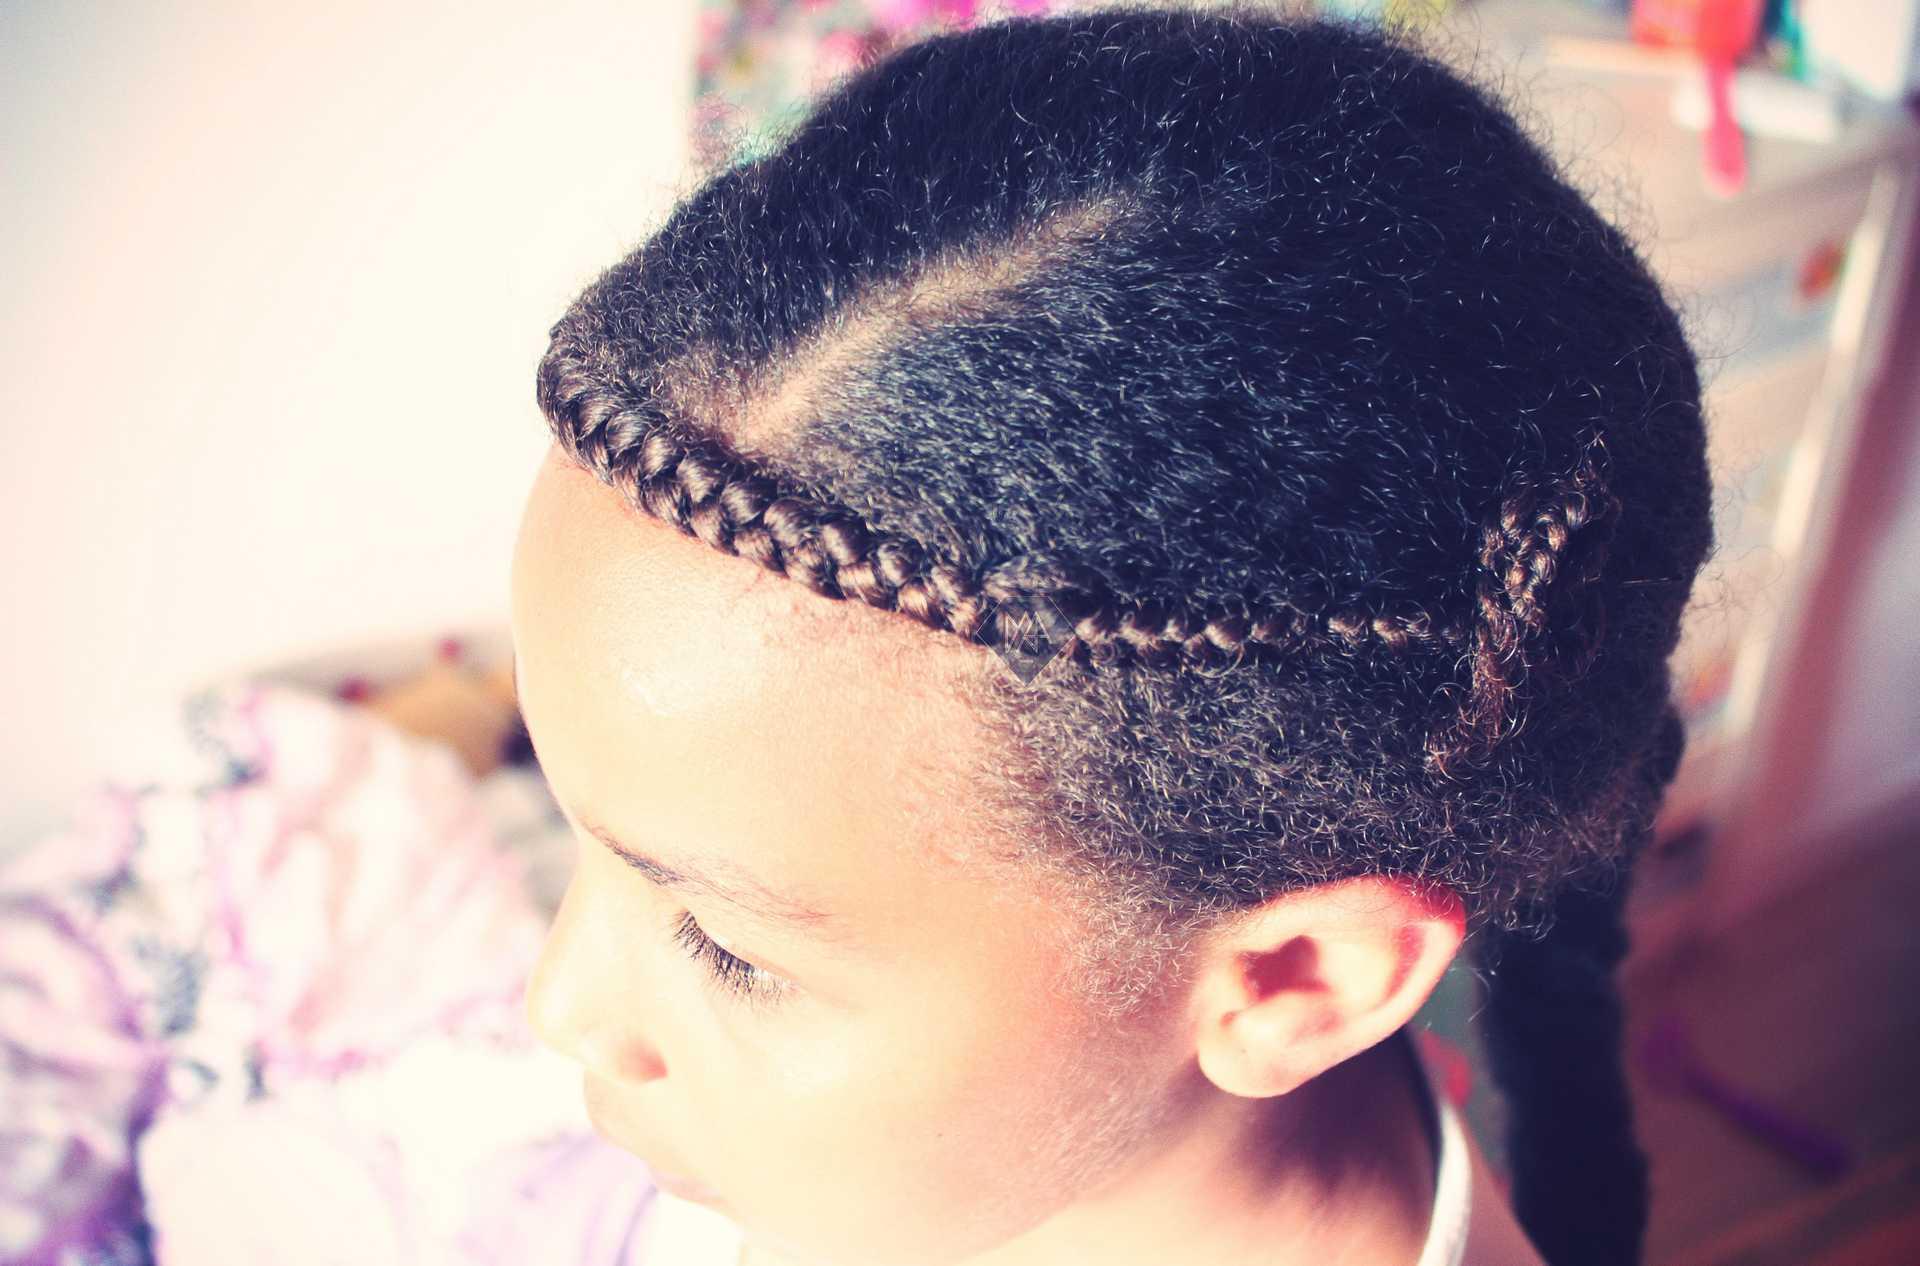 nunaavane-hair-kids-naturalhair-styles-fishtail-braid-beautyandhair-blogger2